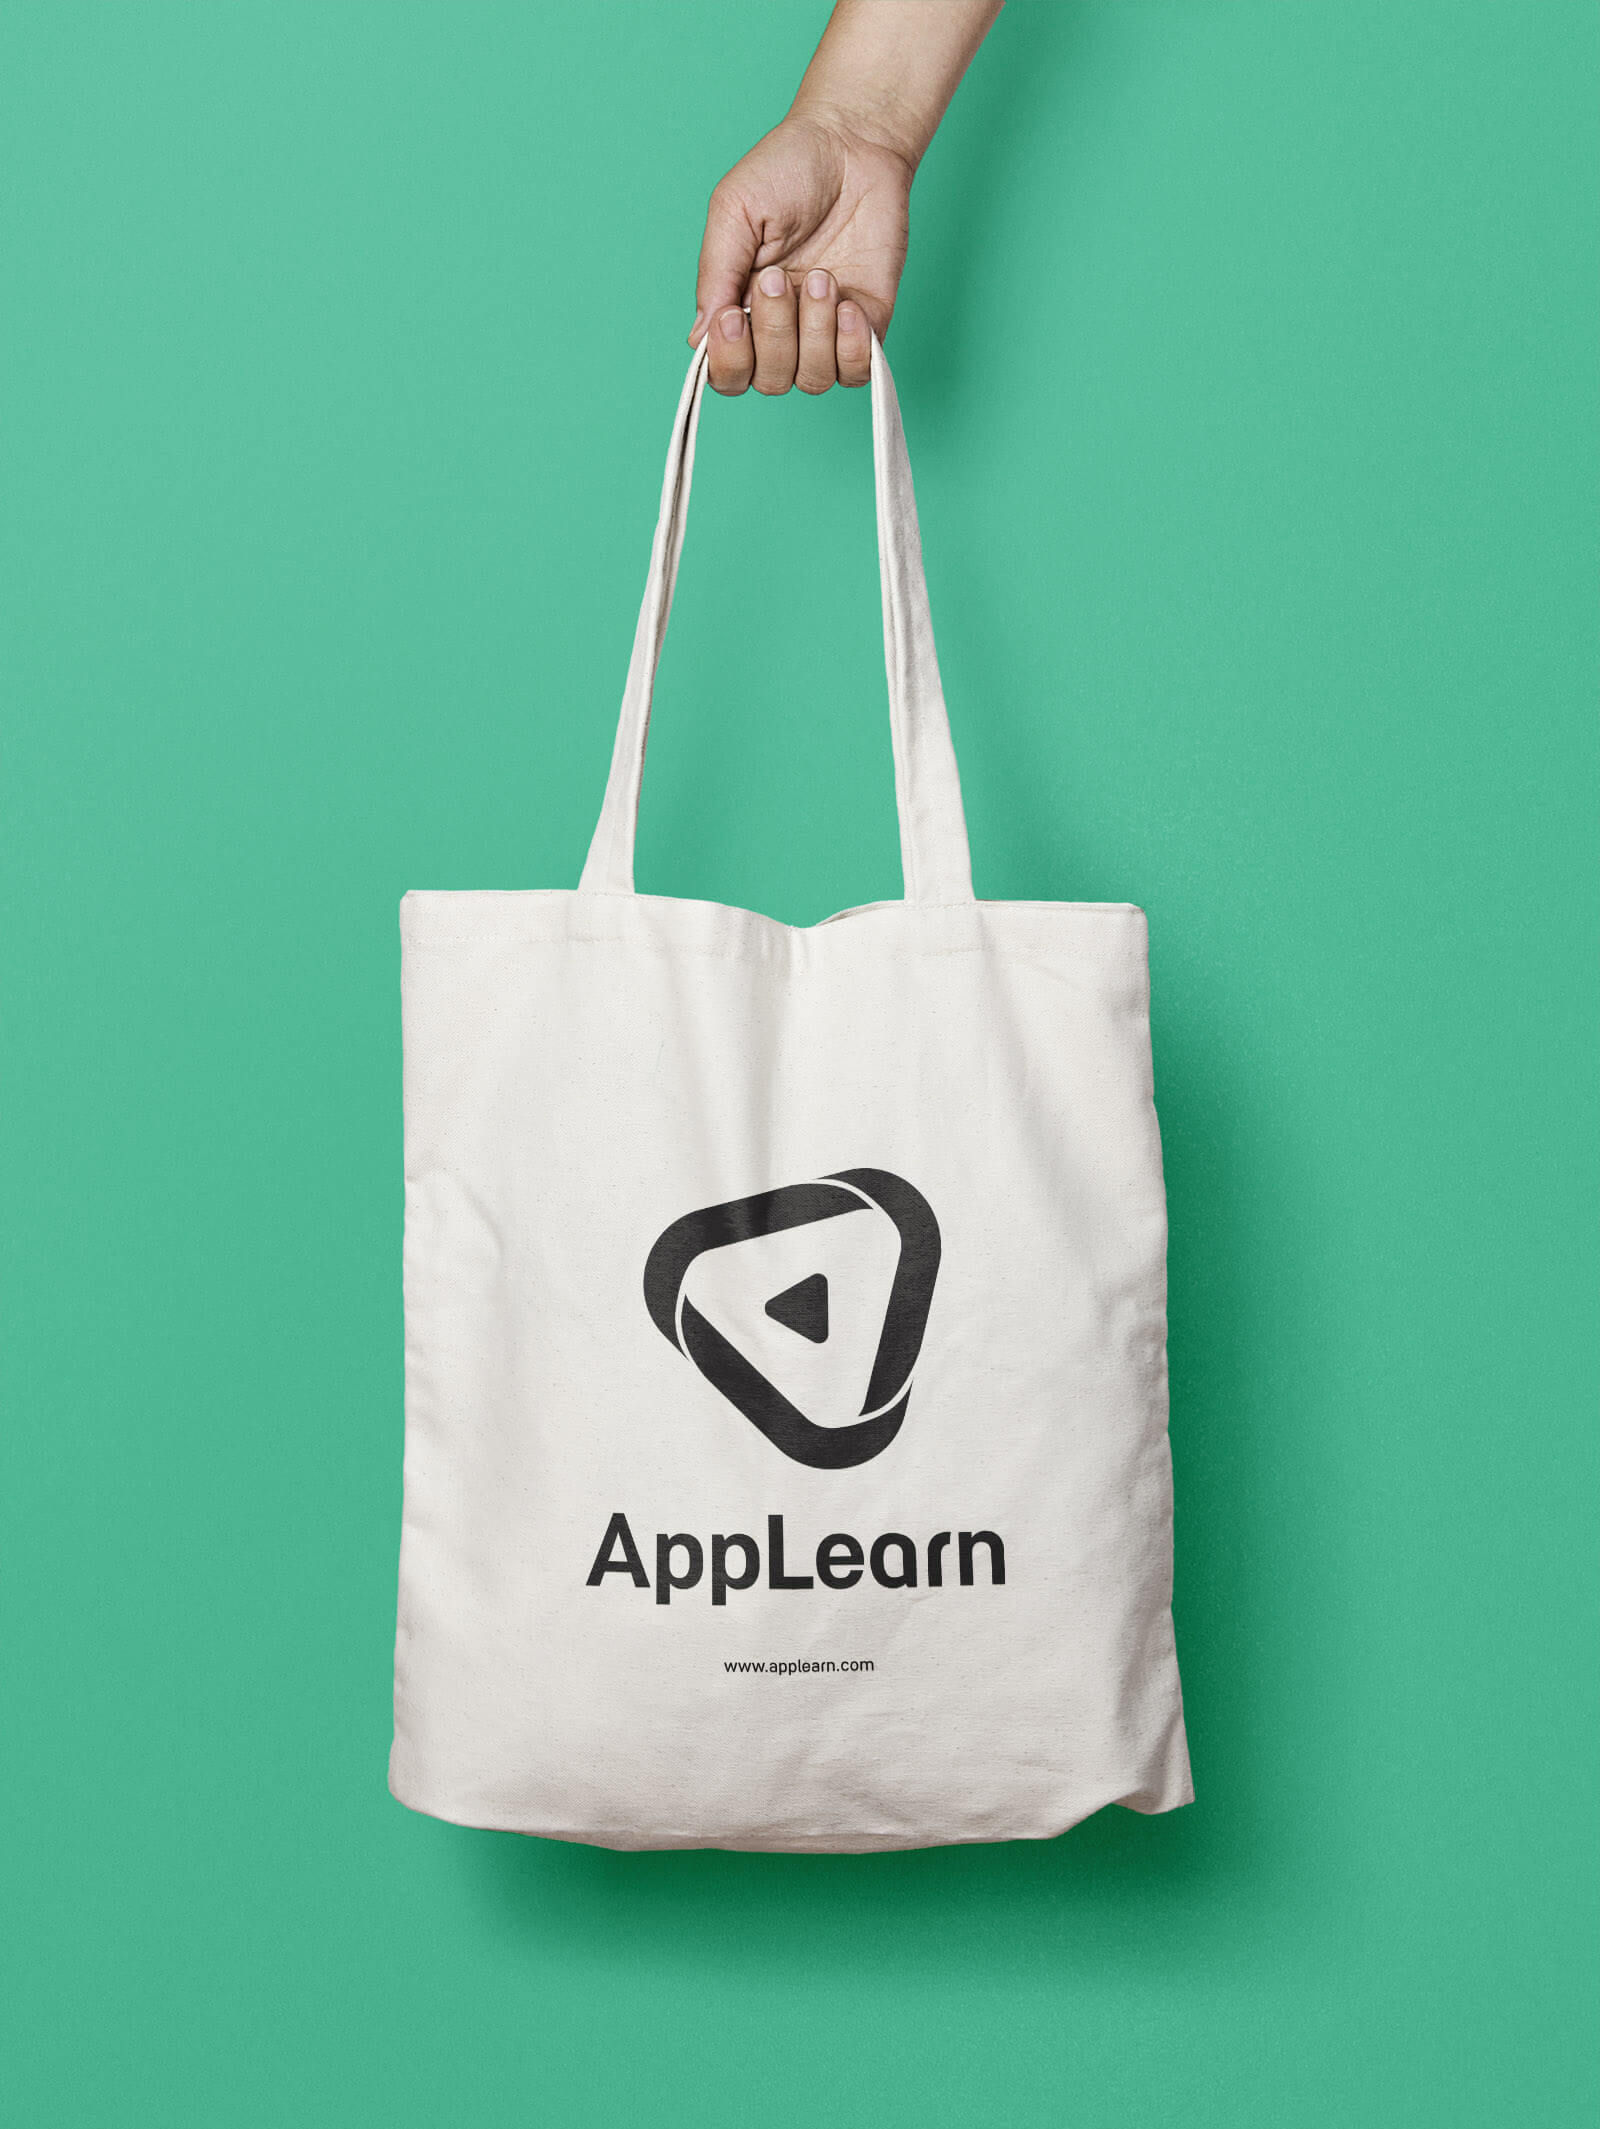 AppLearn Company Branding